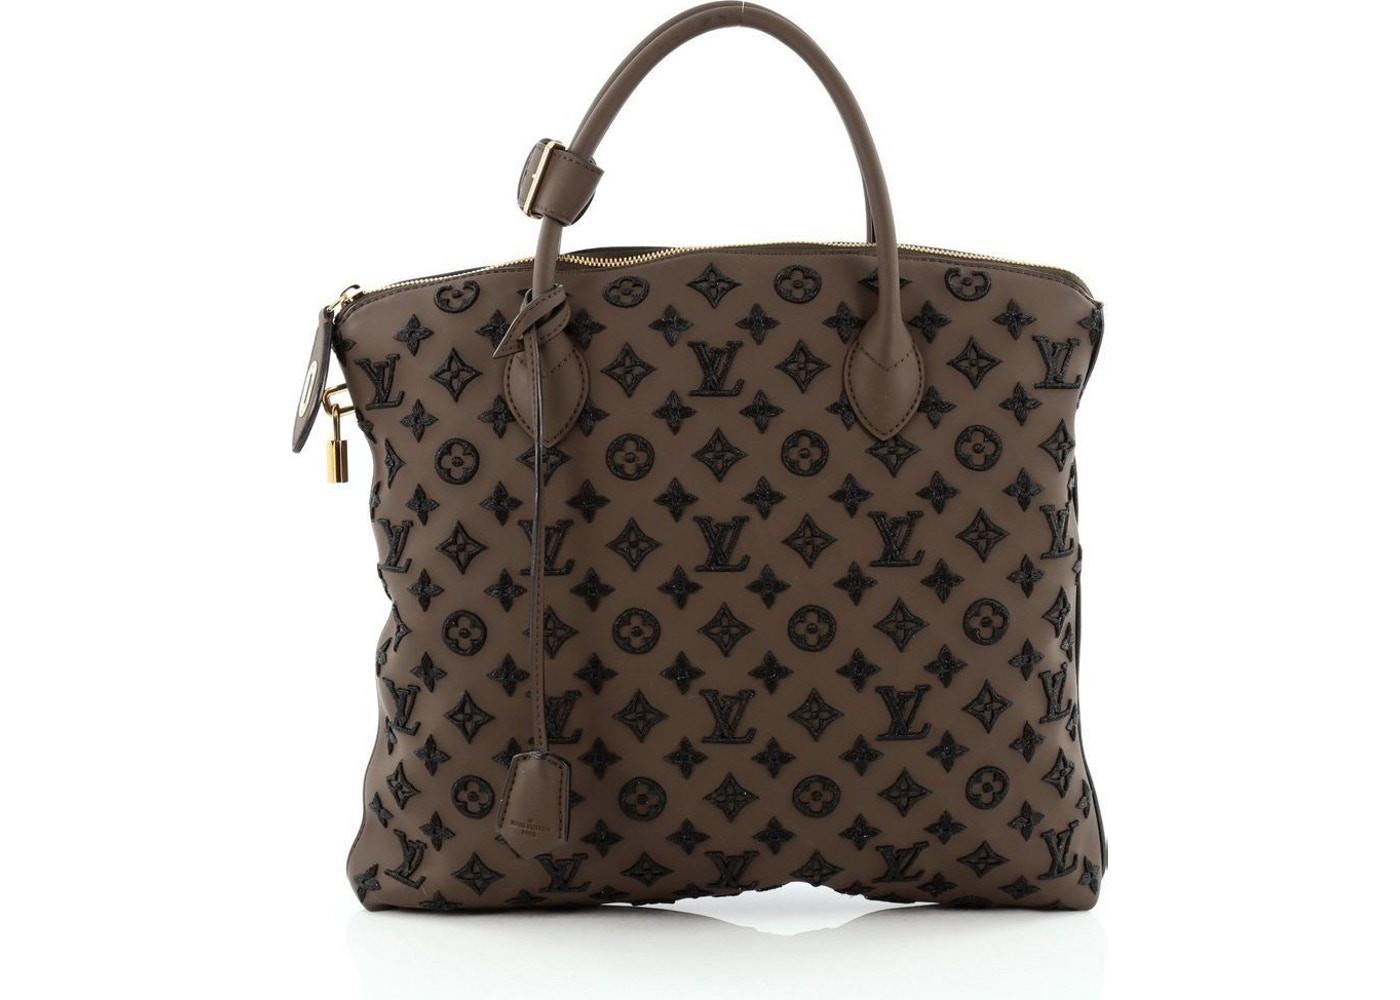 c52449ab9f8f Louis Vuitton Lockit Vertical Monogram Addiction Rubber Black Brown